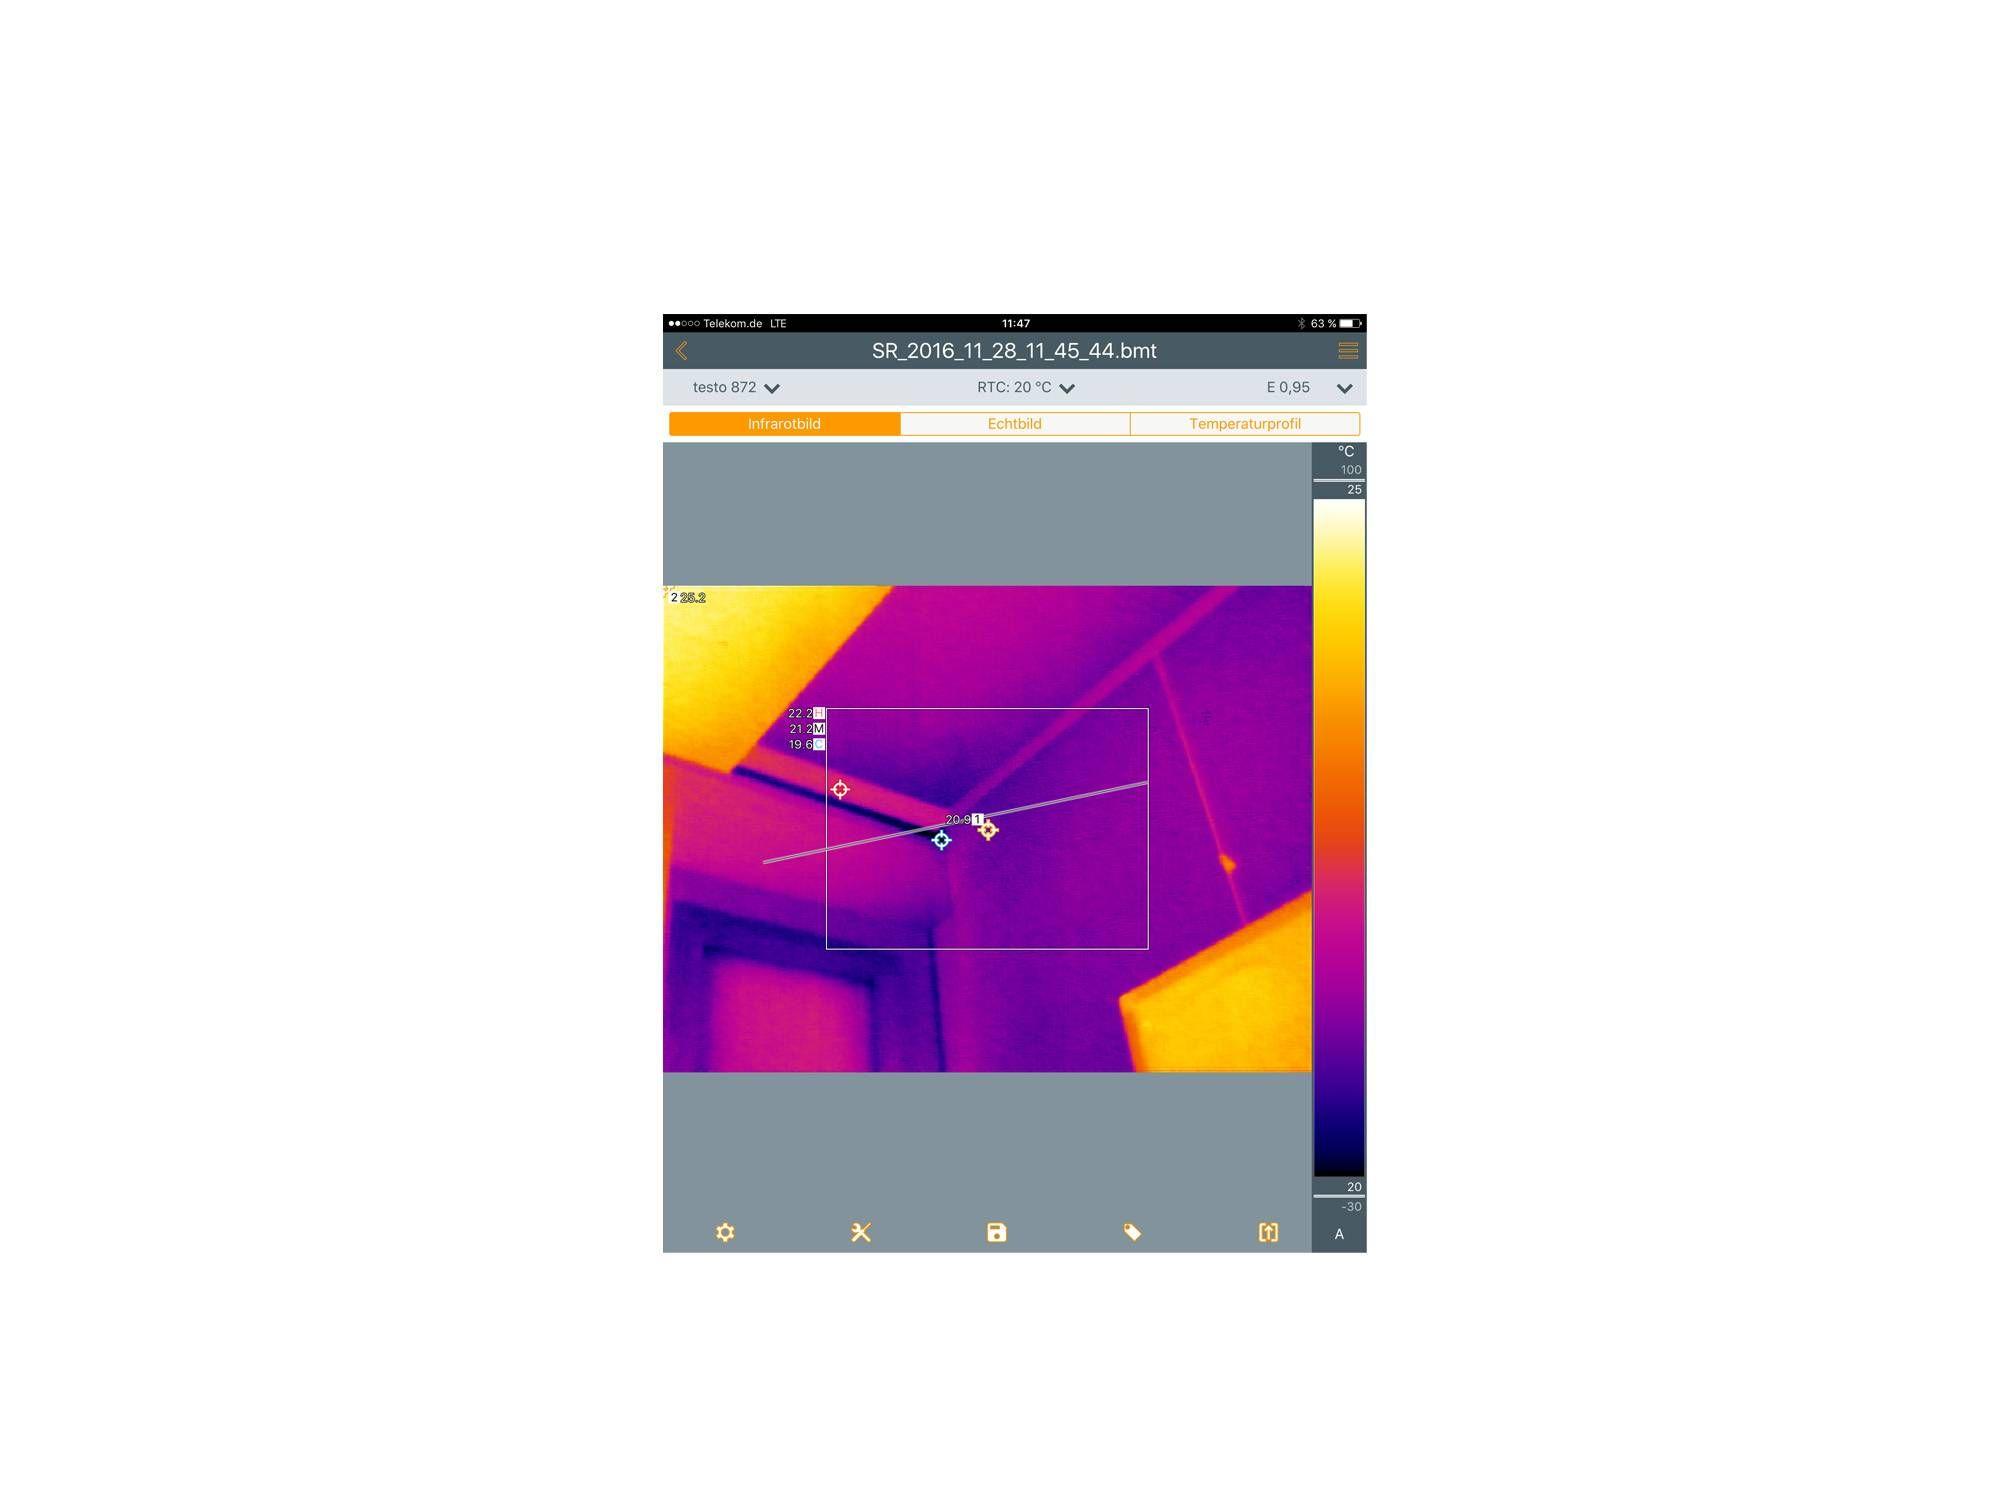 thermography-app-analyse-profillinie.jpg